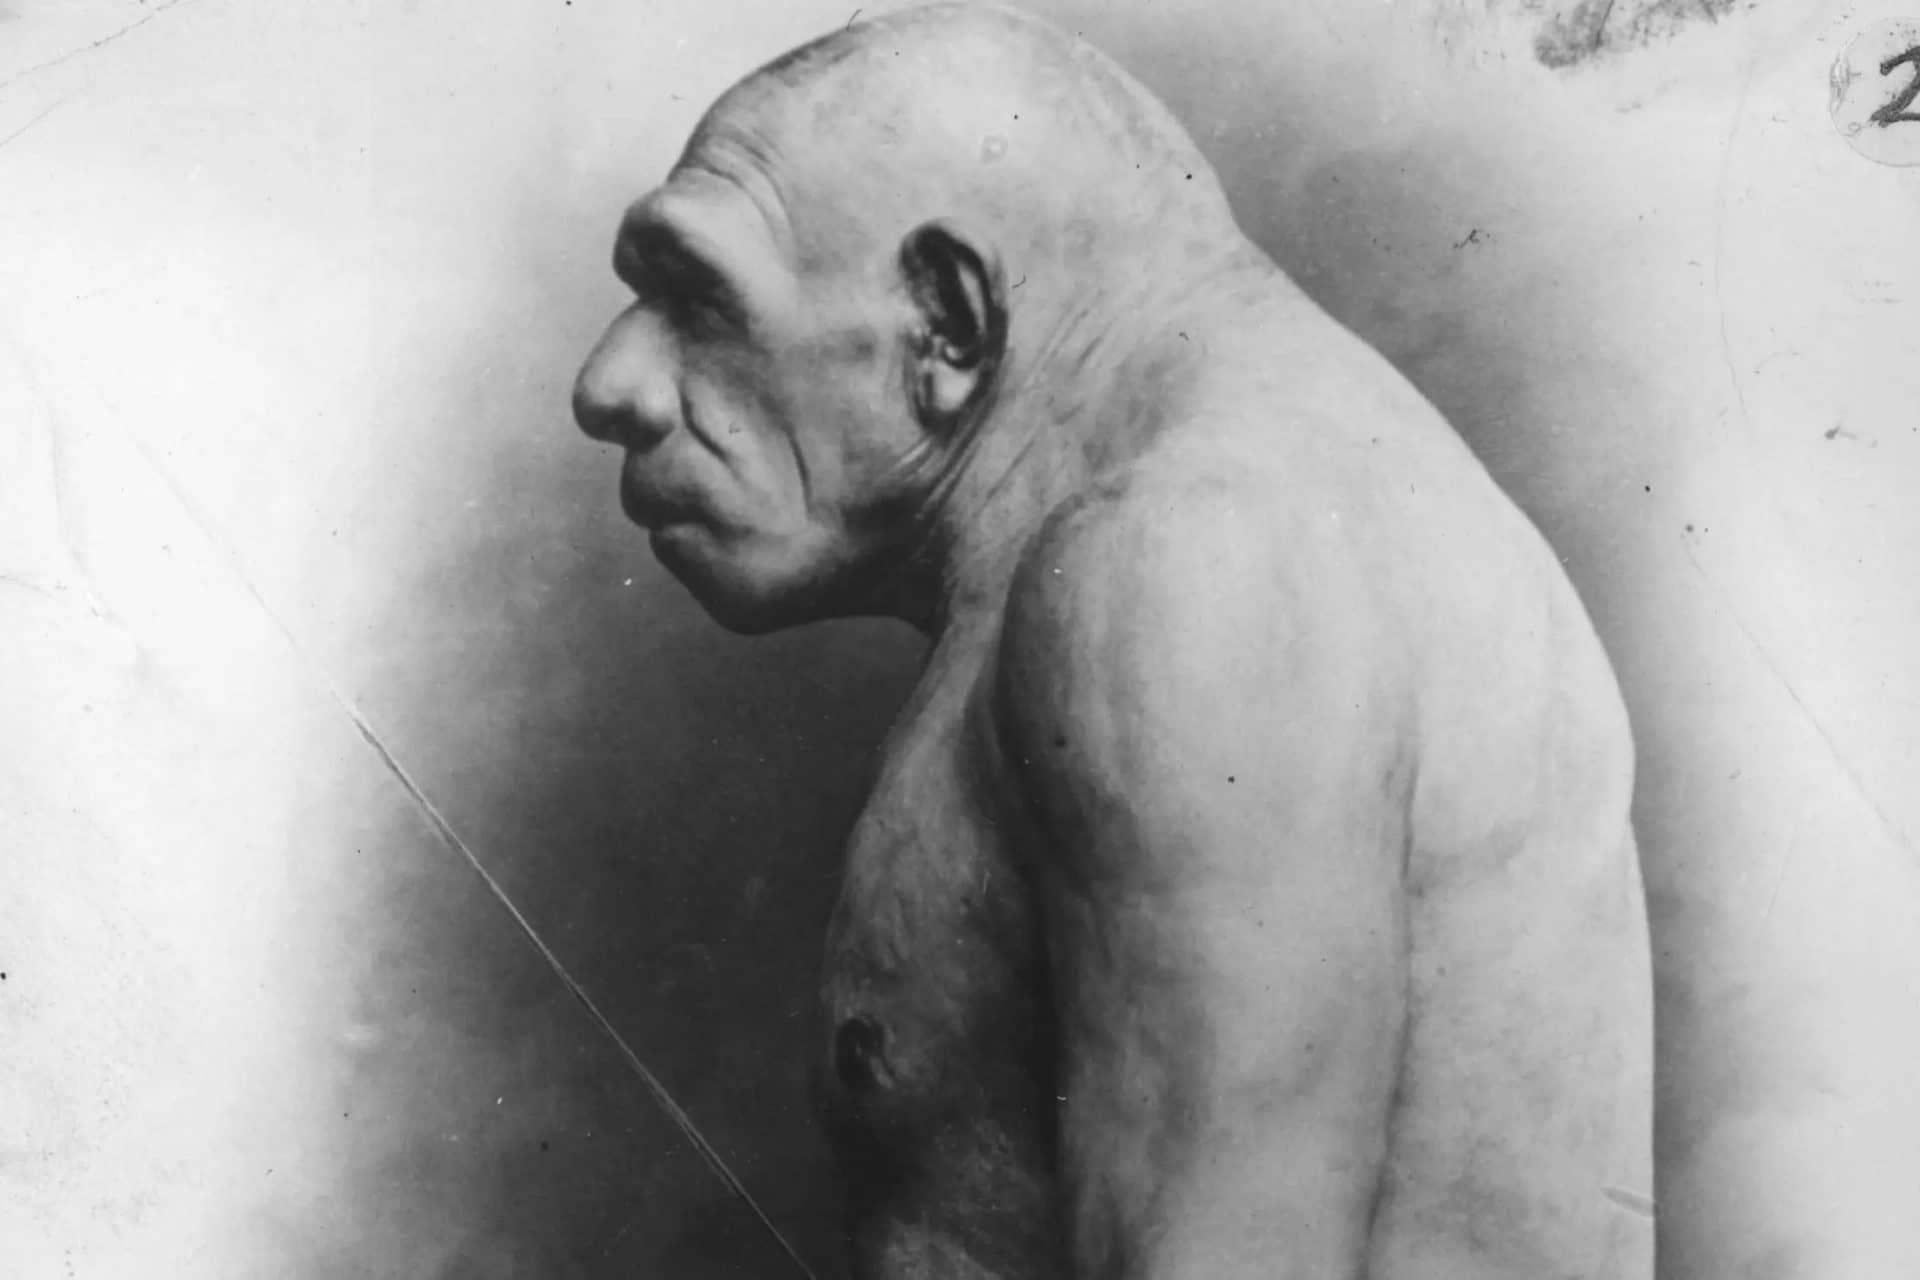 Fóssil De Homem Neandertal